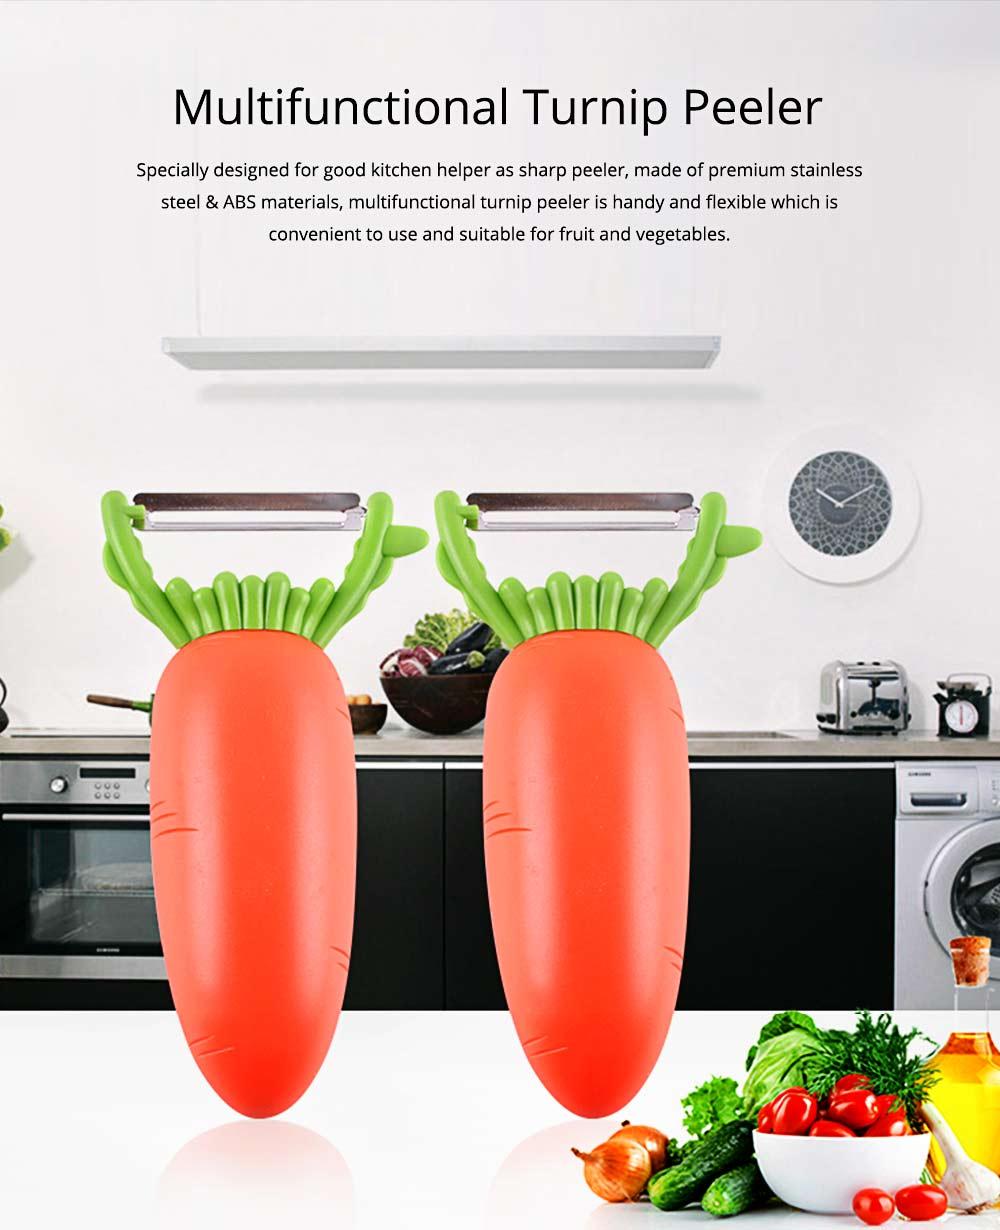 Multifunctional Turnip Peeler Fruit Potato Peeler, Stainless Steel Peeler with Beer Bottle Opener, Kitchen Cut Tools 0